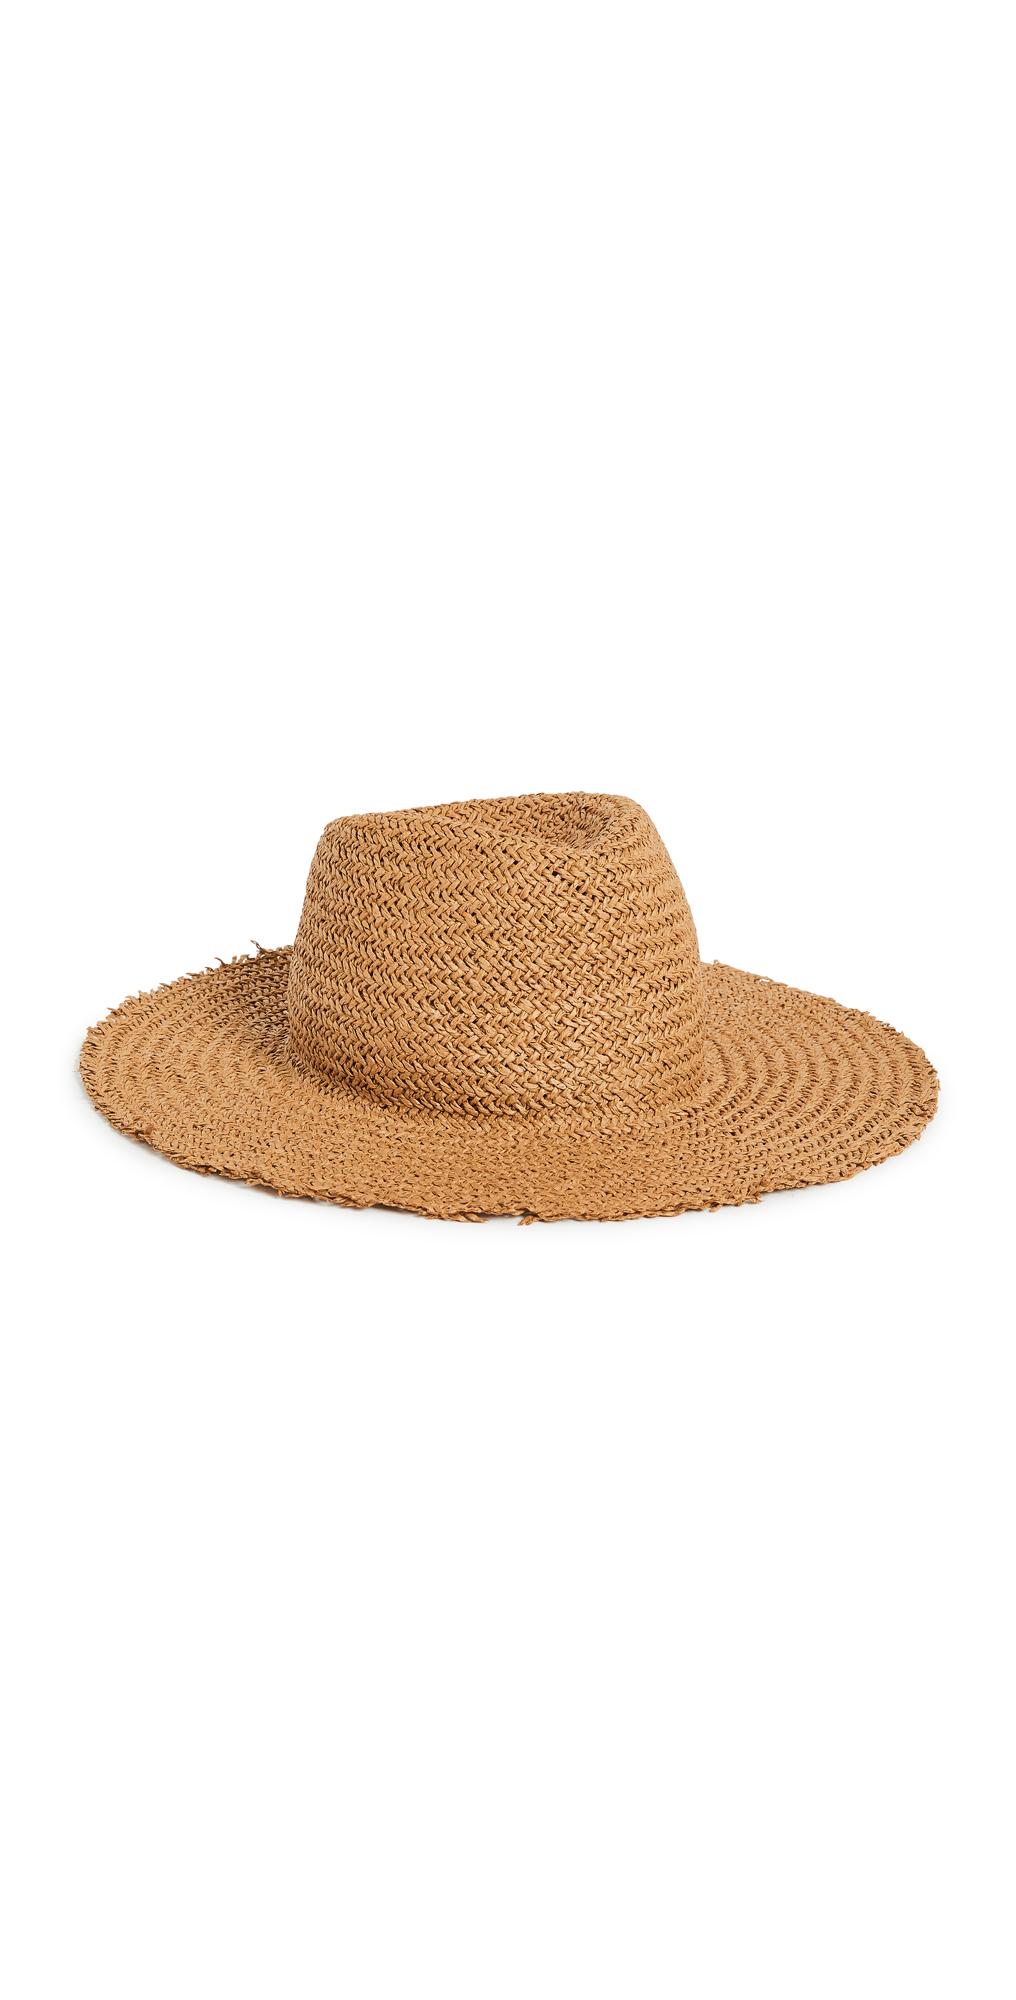 Beach Rancher Hat